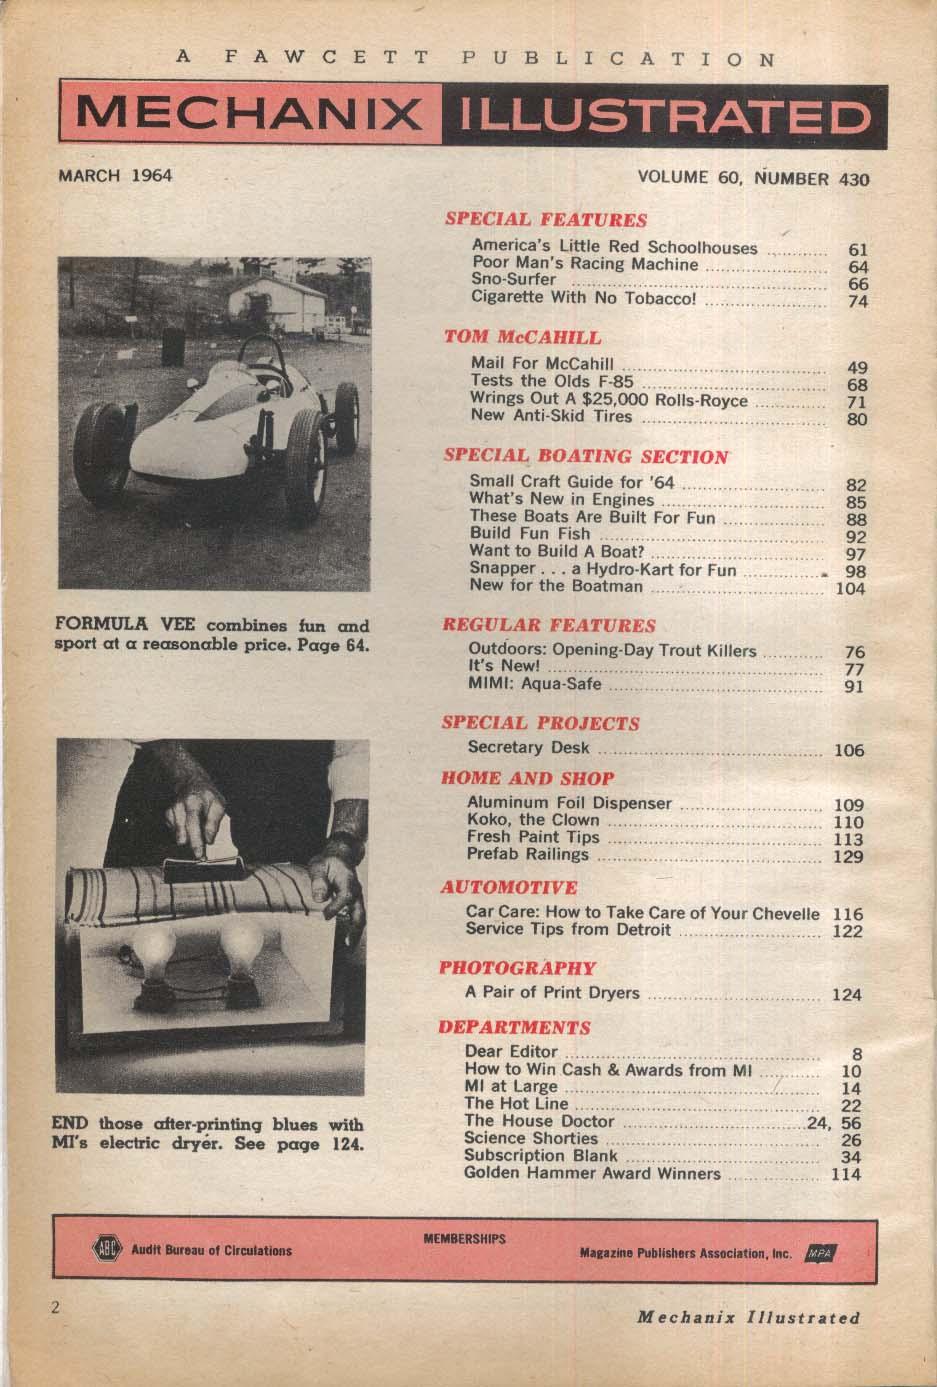 MECHANIX ILLUSTRATED Oldsmobile F-85 Rolls-Royce road tests Chevelle 3 1964